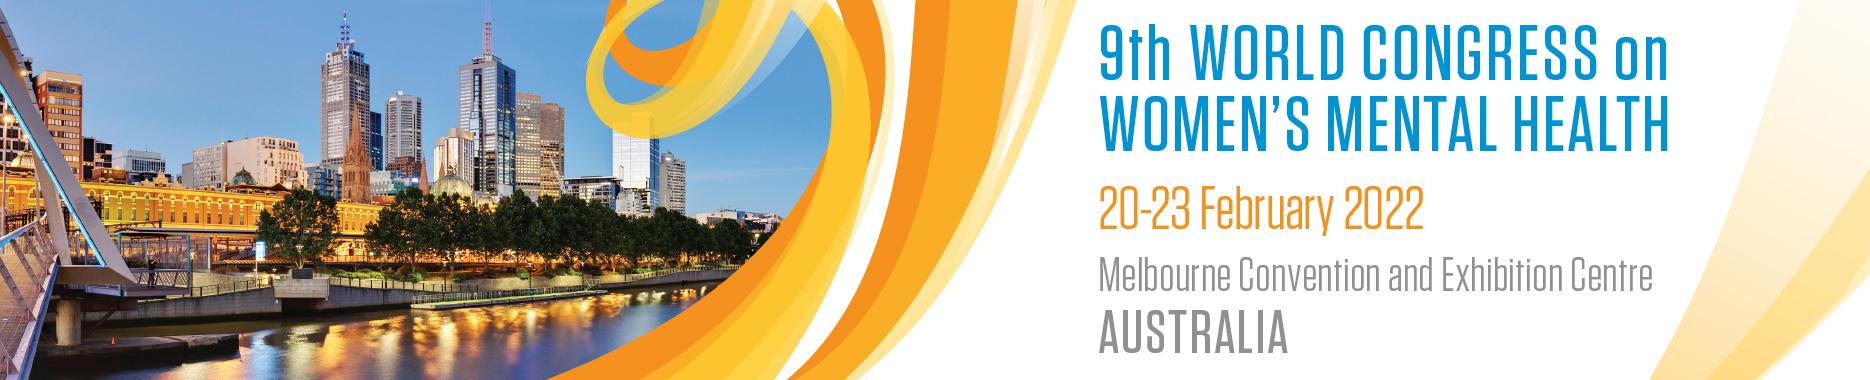 9th World Congress on Women's Mental Health